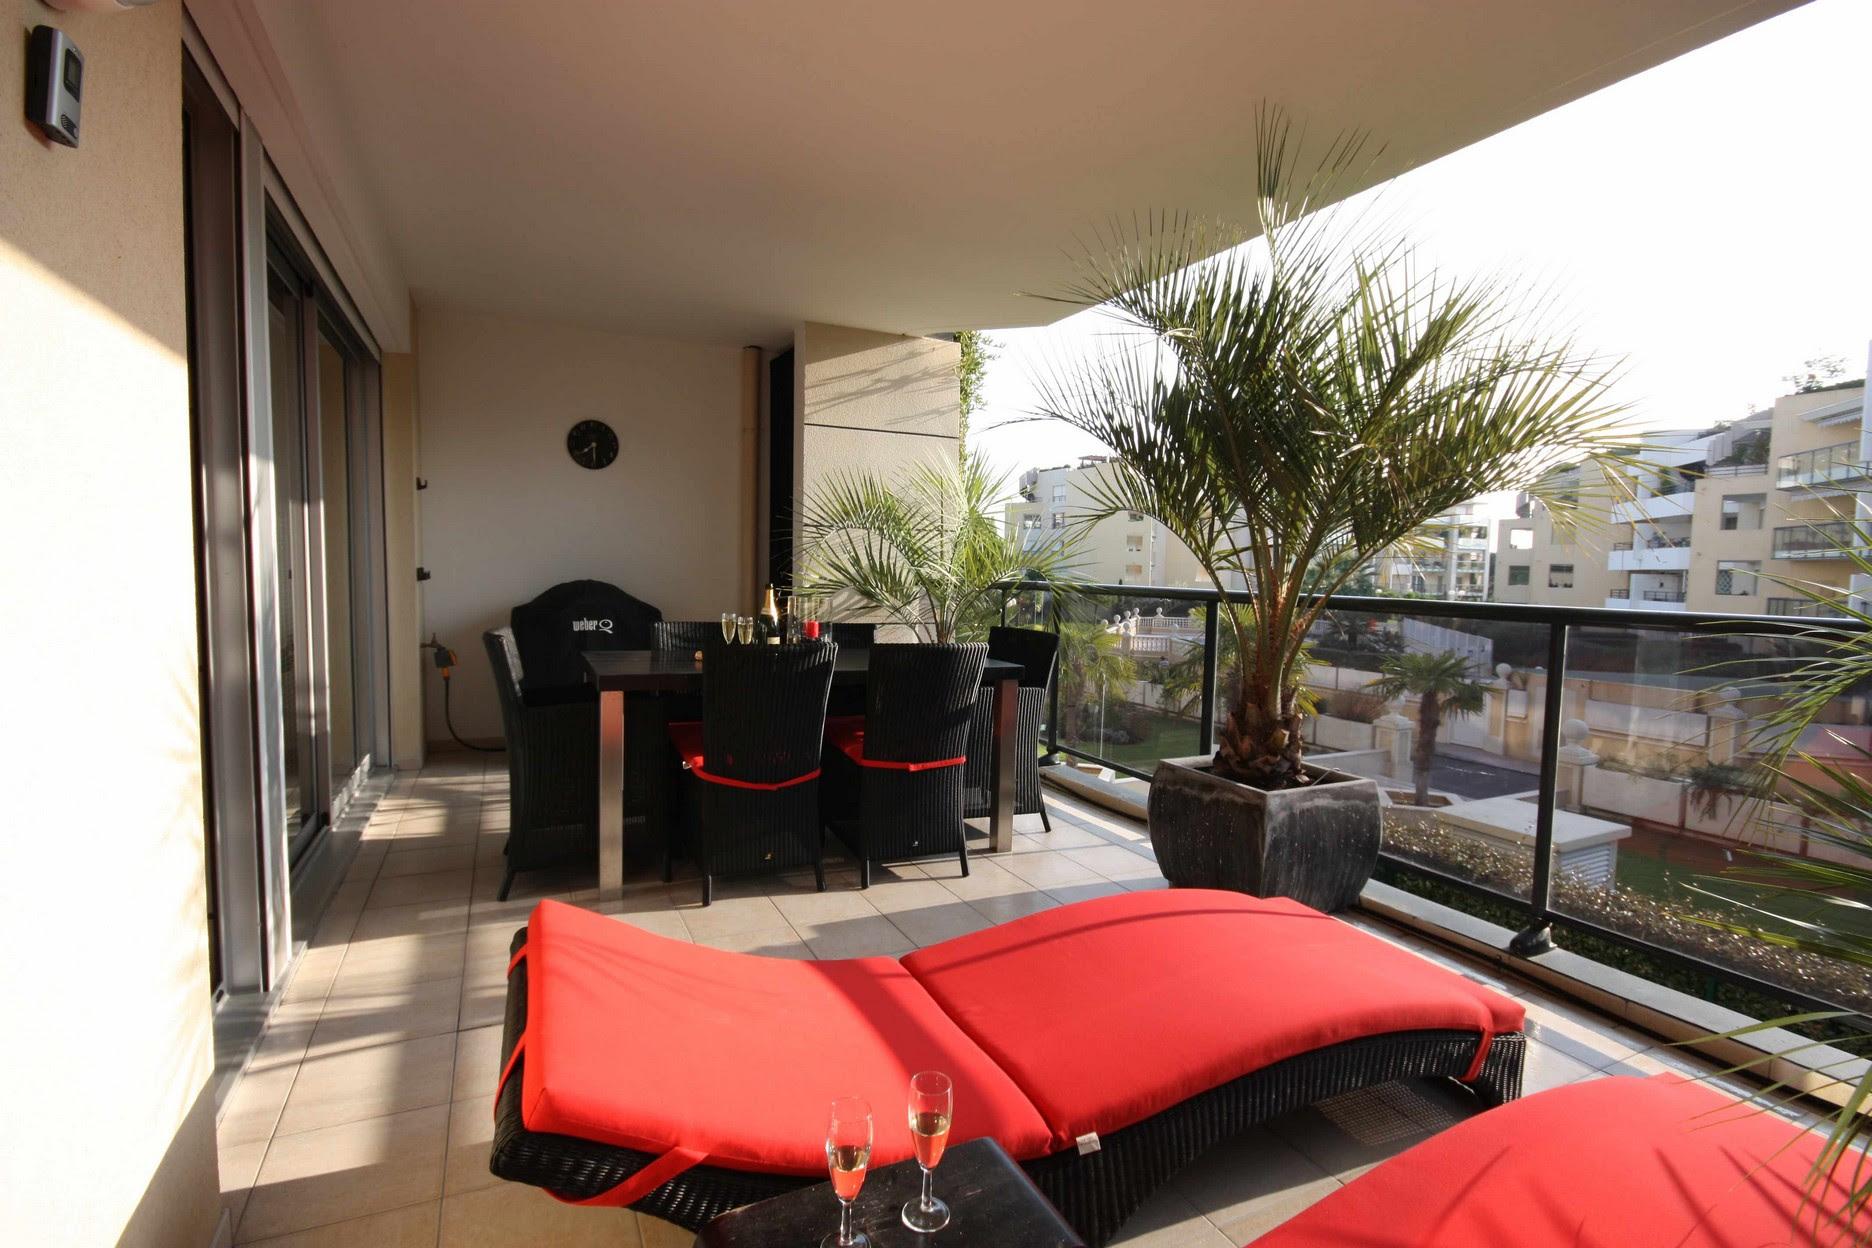 Apartment Balcony Furniture - HomesFeed